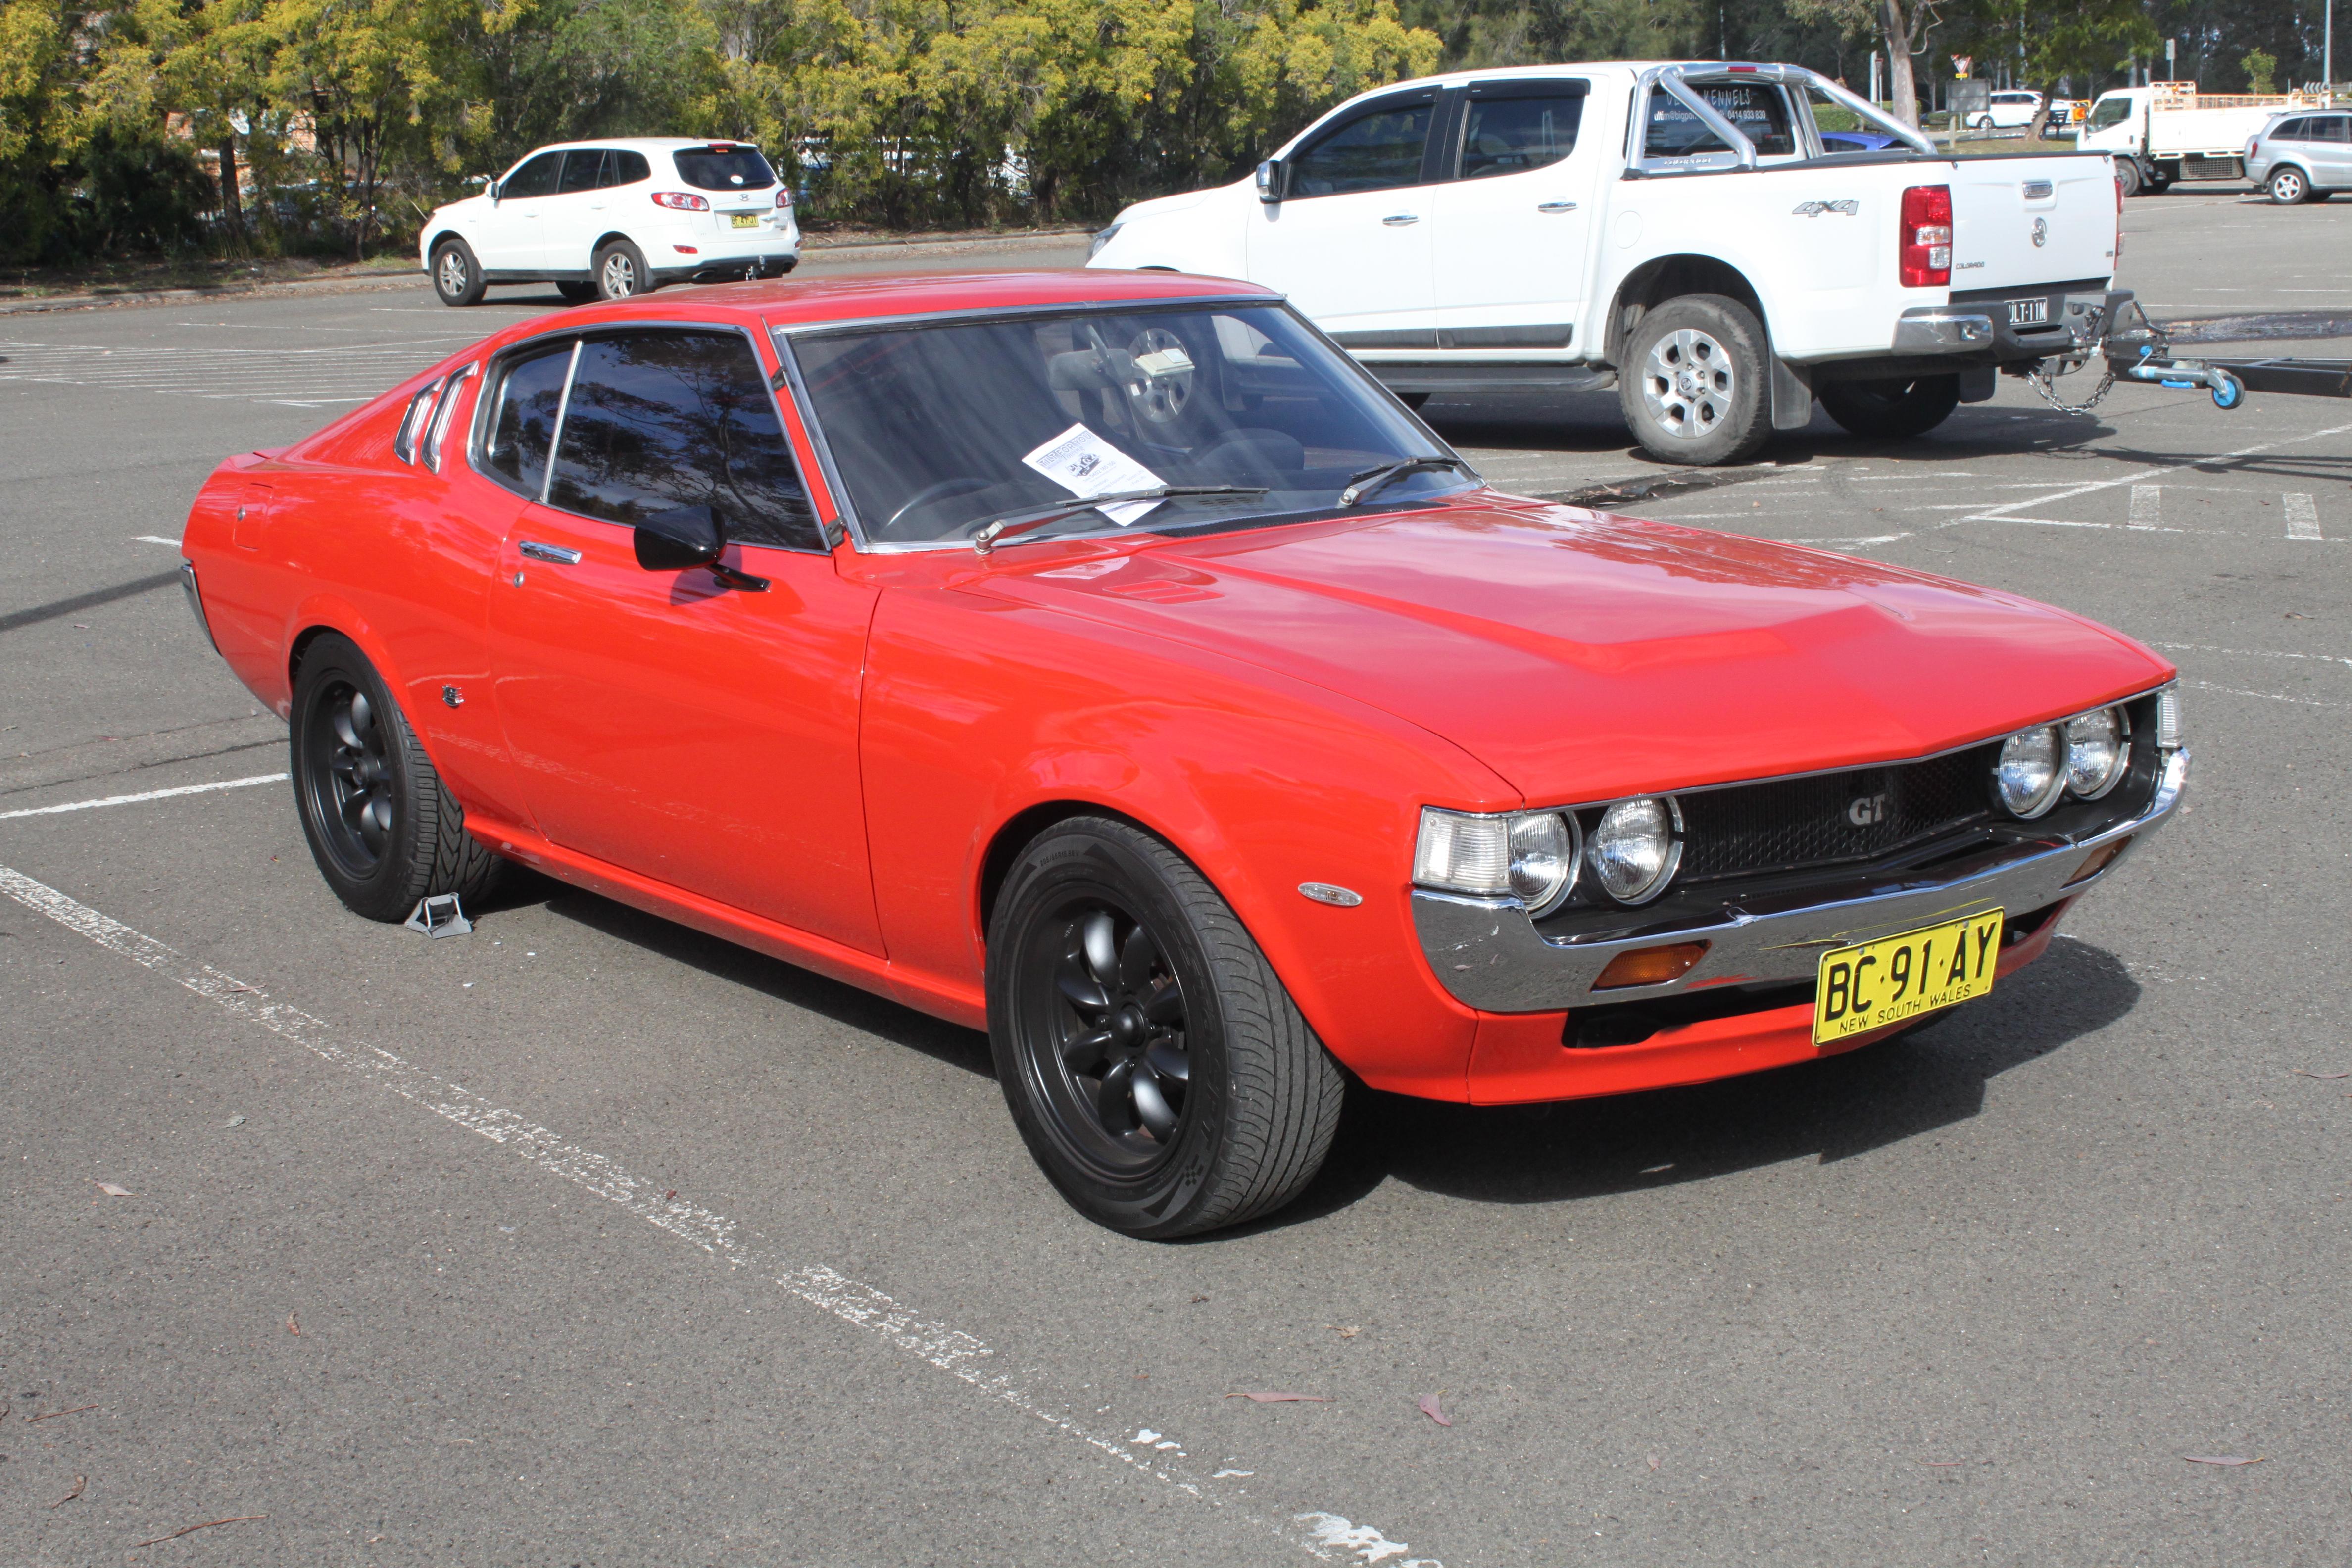 Toyota Celica Lt 1977 >> File:1977 Toyota Celica (RA28) LT liftback (20197667076).jpg - Wikimedia Commons